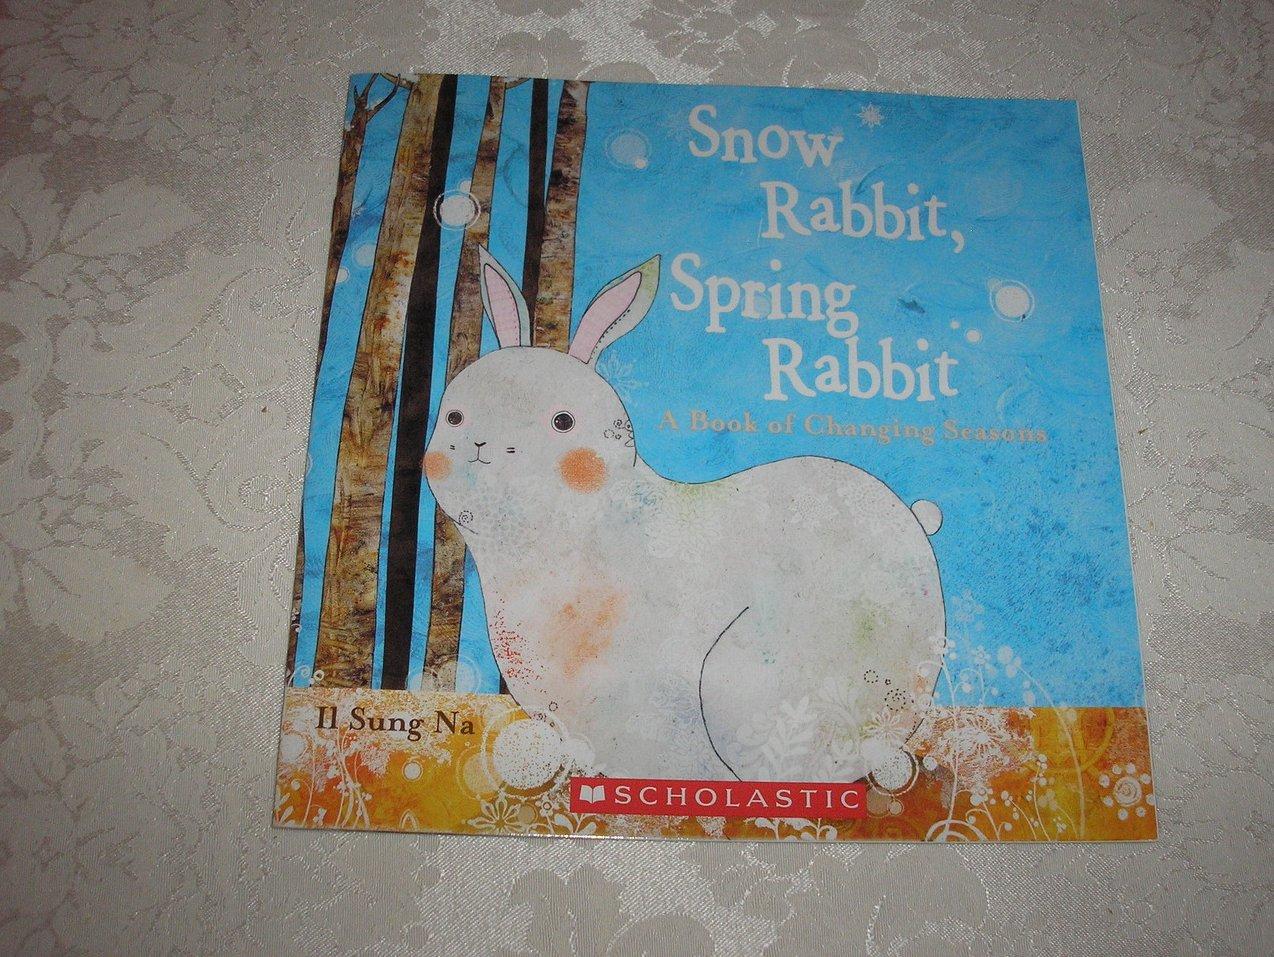 Snow Rabbit, Spring Rabbit brand new paperback Il Sung Na